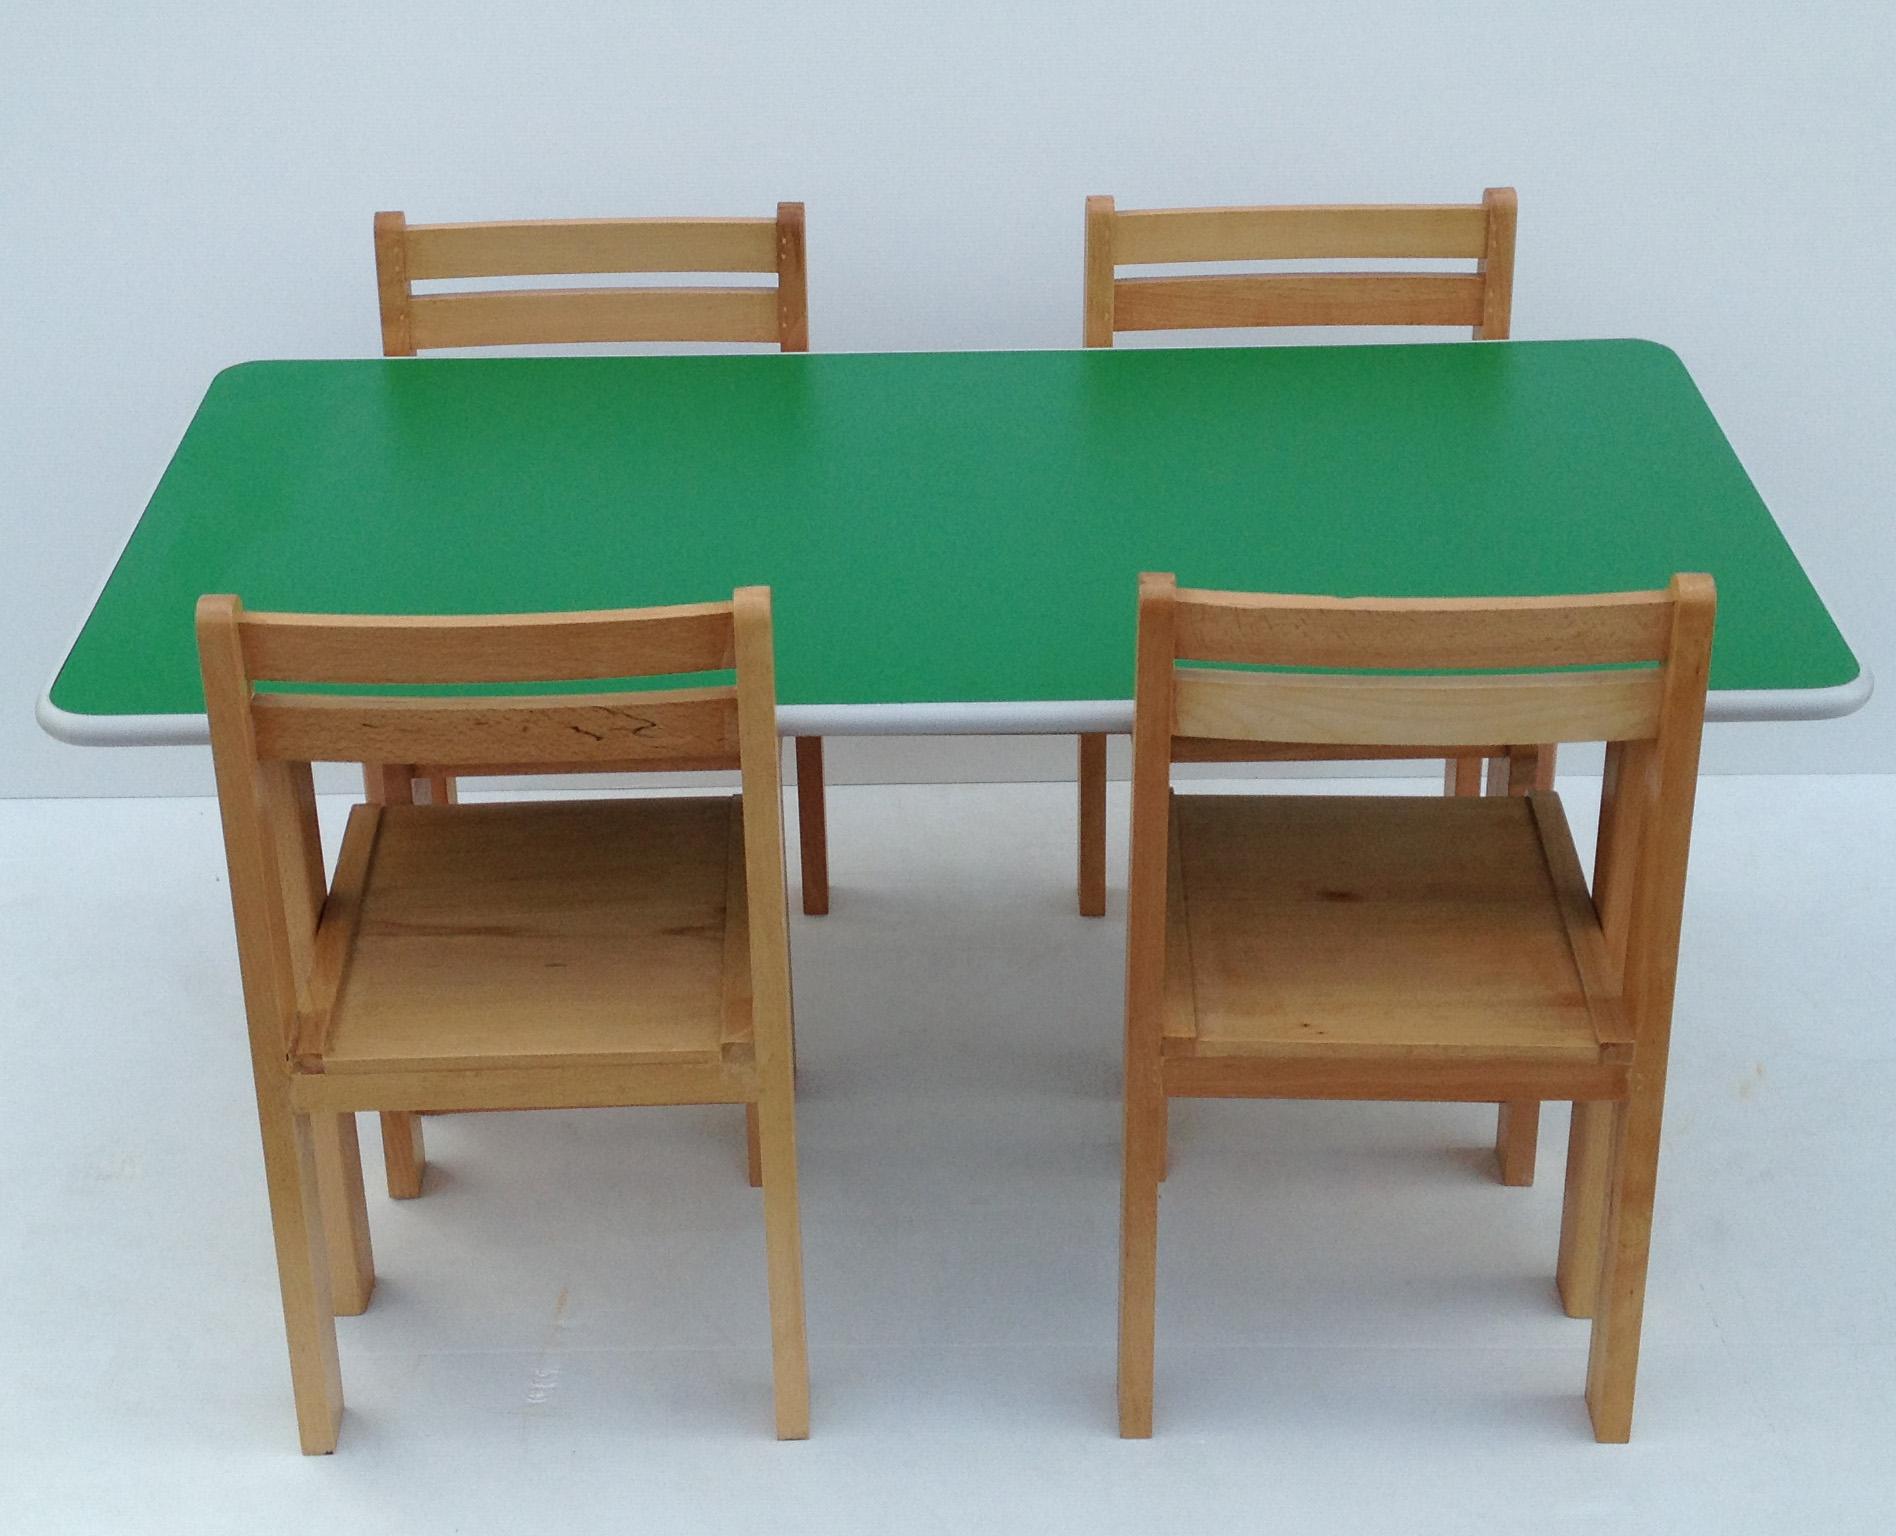 Pre School Kids Table & Chairs Classroom Desk